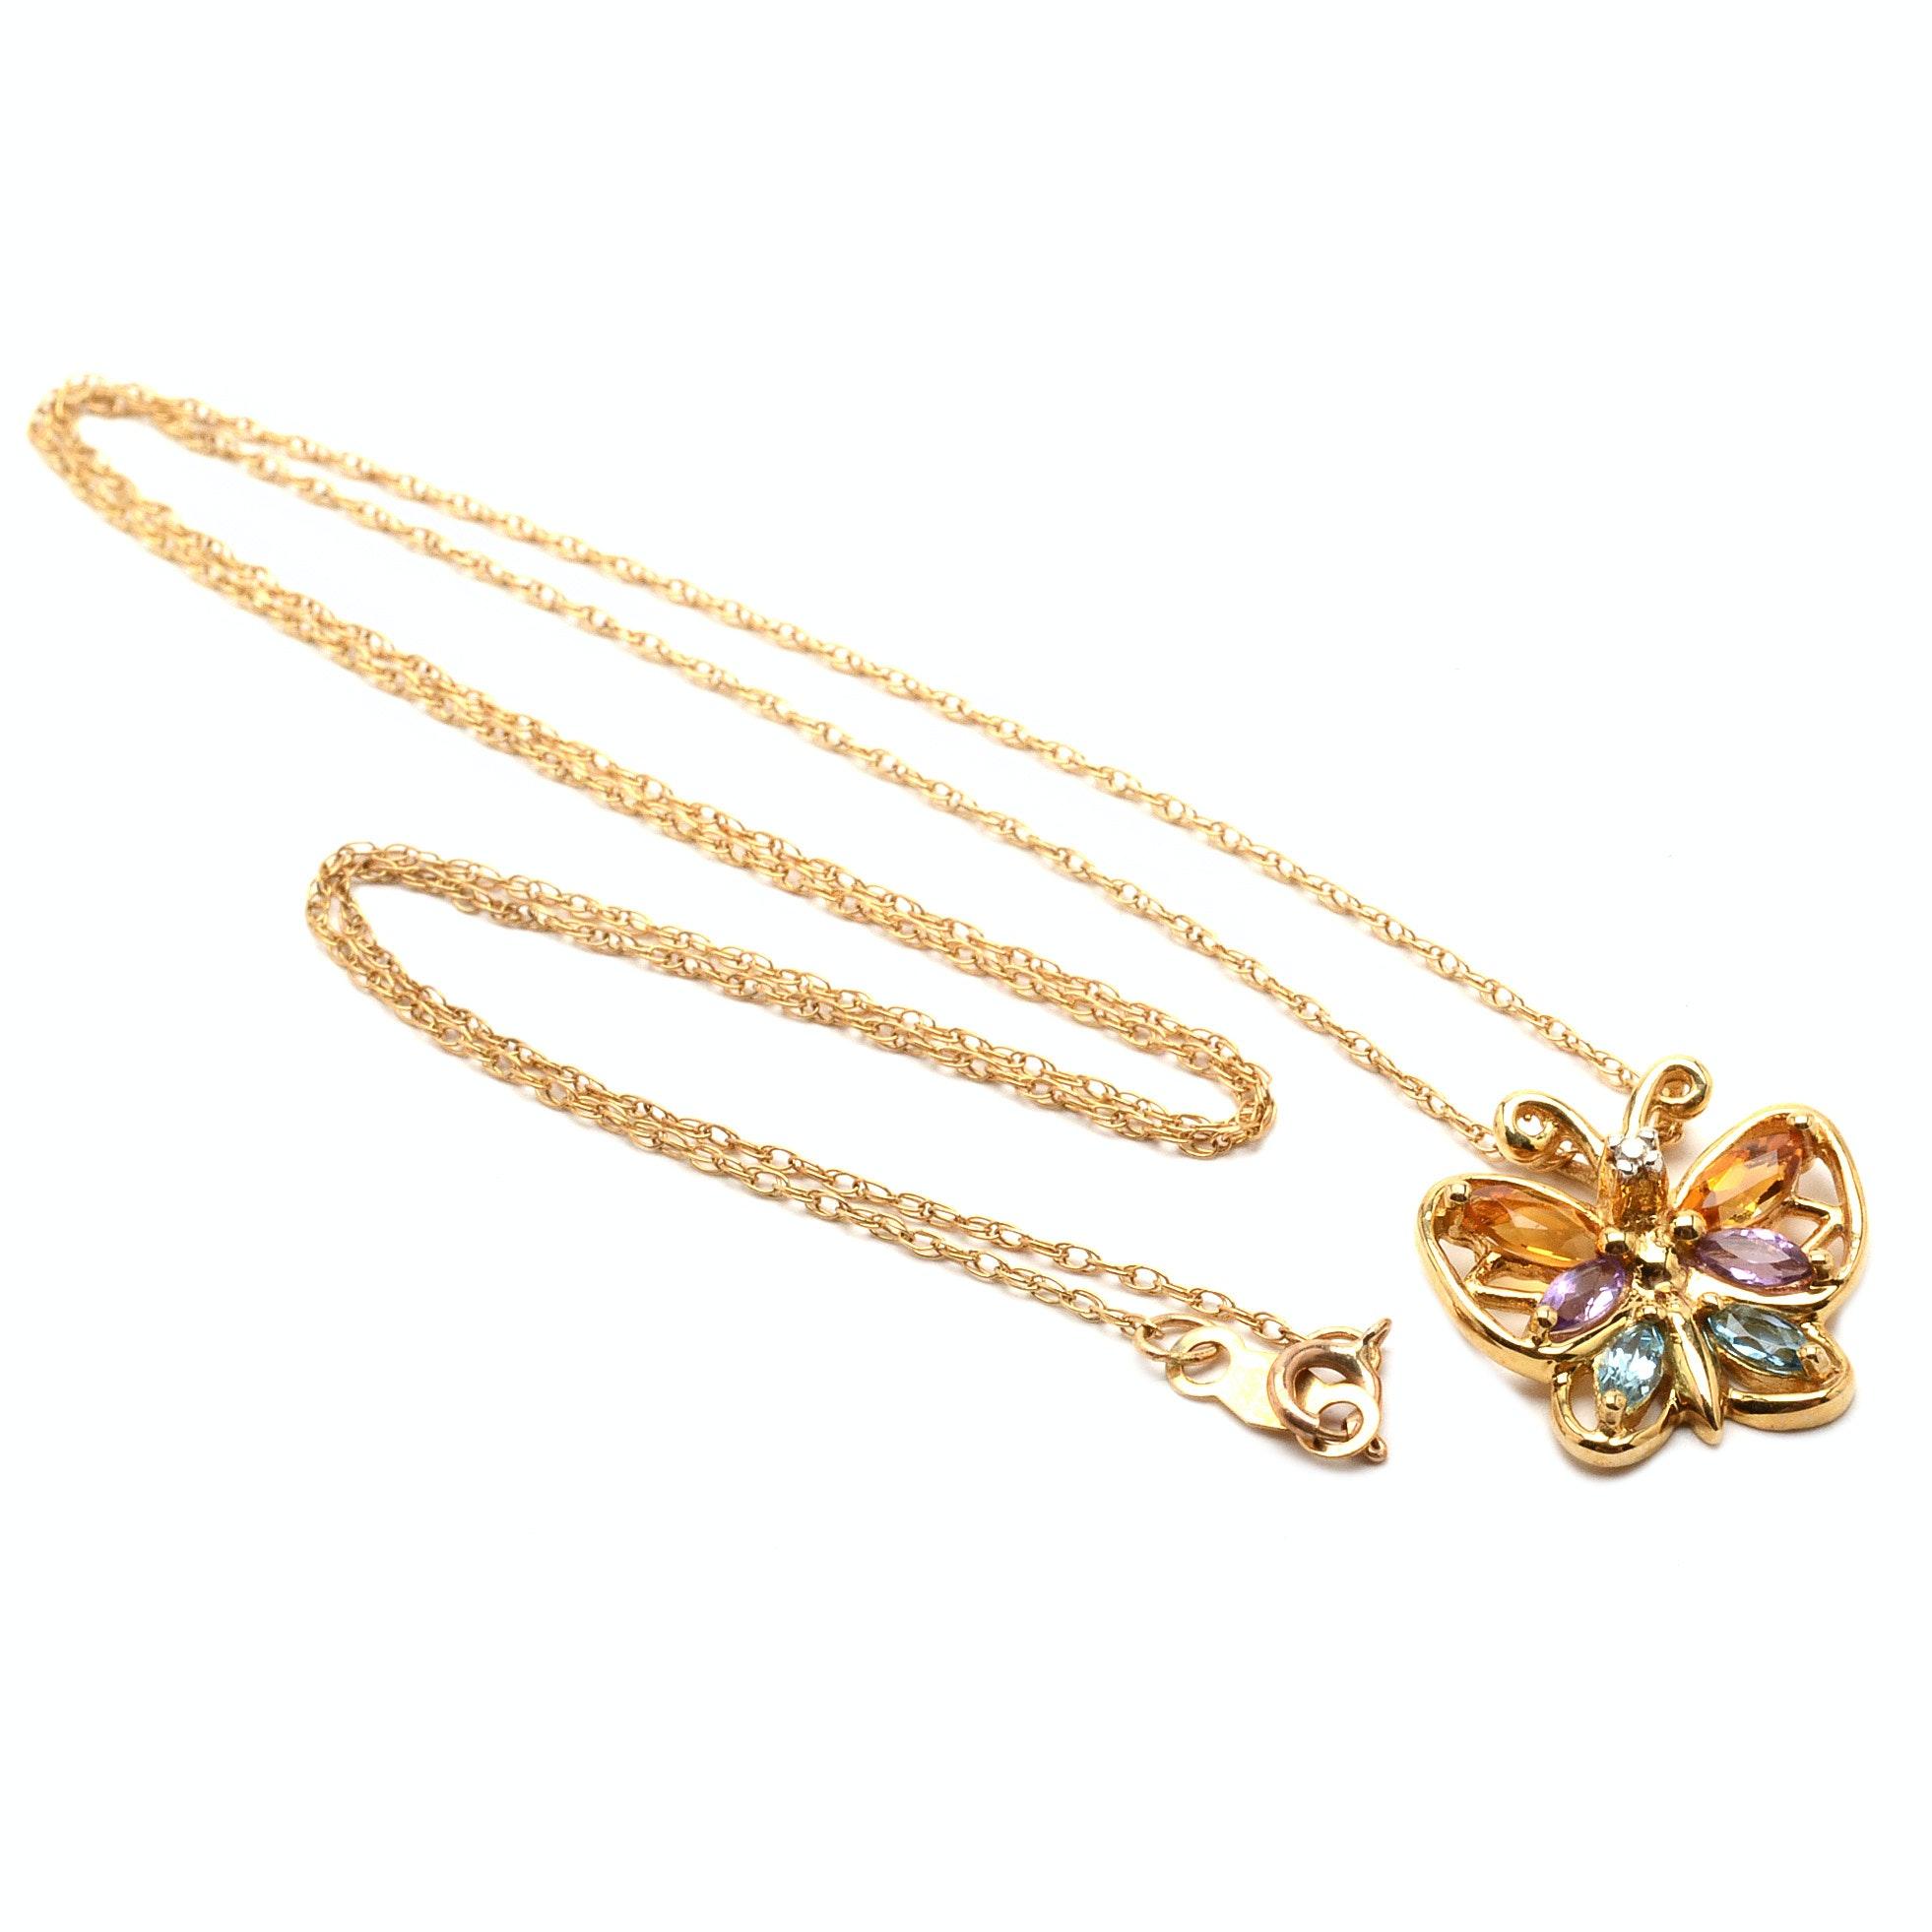 10K Yellow Gold Diamond, Citrine, Amethyst, Blue Topaz Butterfly Necklace